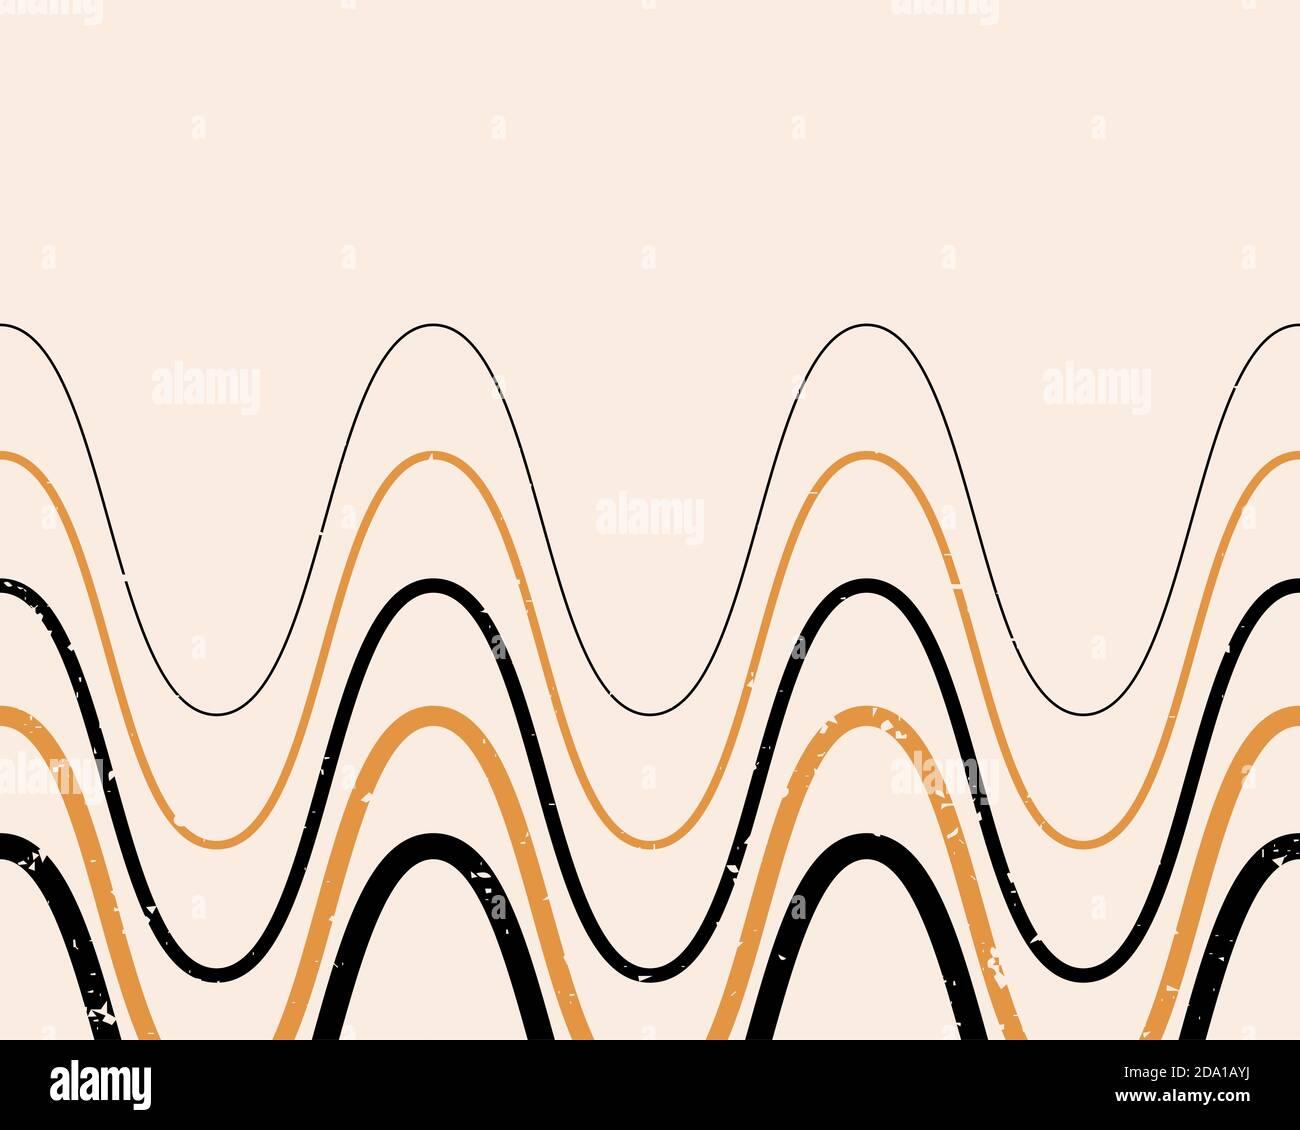 Abstract Contemporary Aesthetic Background With Geometric Balance Shapes Boho Wall Decor Mid Century Modern Minimalist Neutral Art Print Organic Sh Stock Vector Image Art Alamy